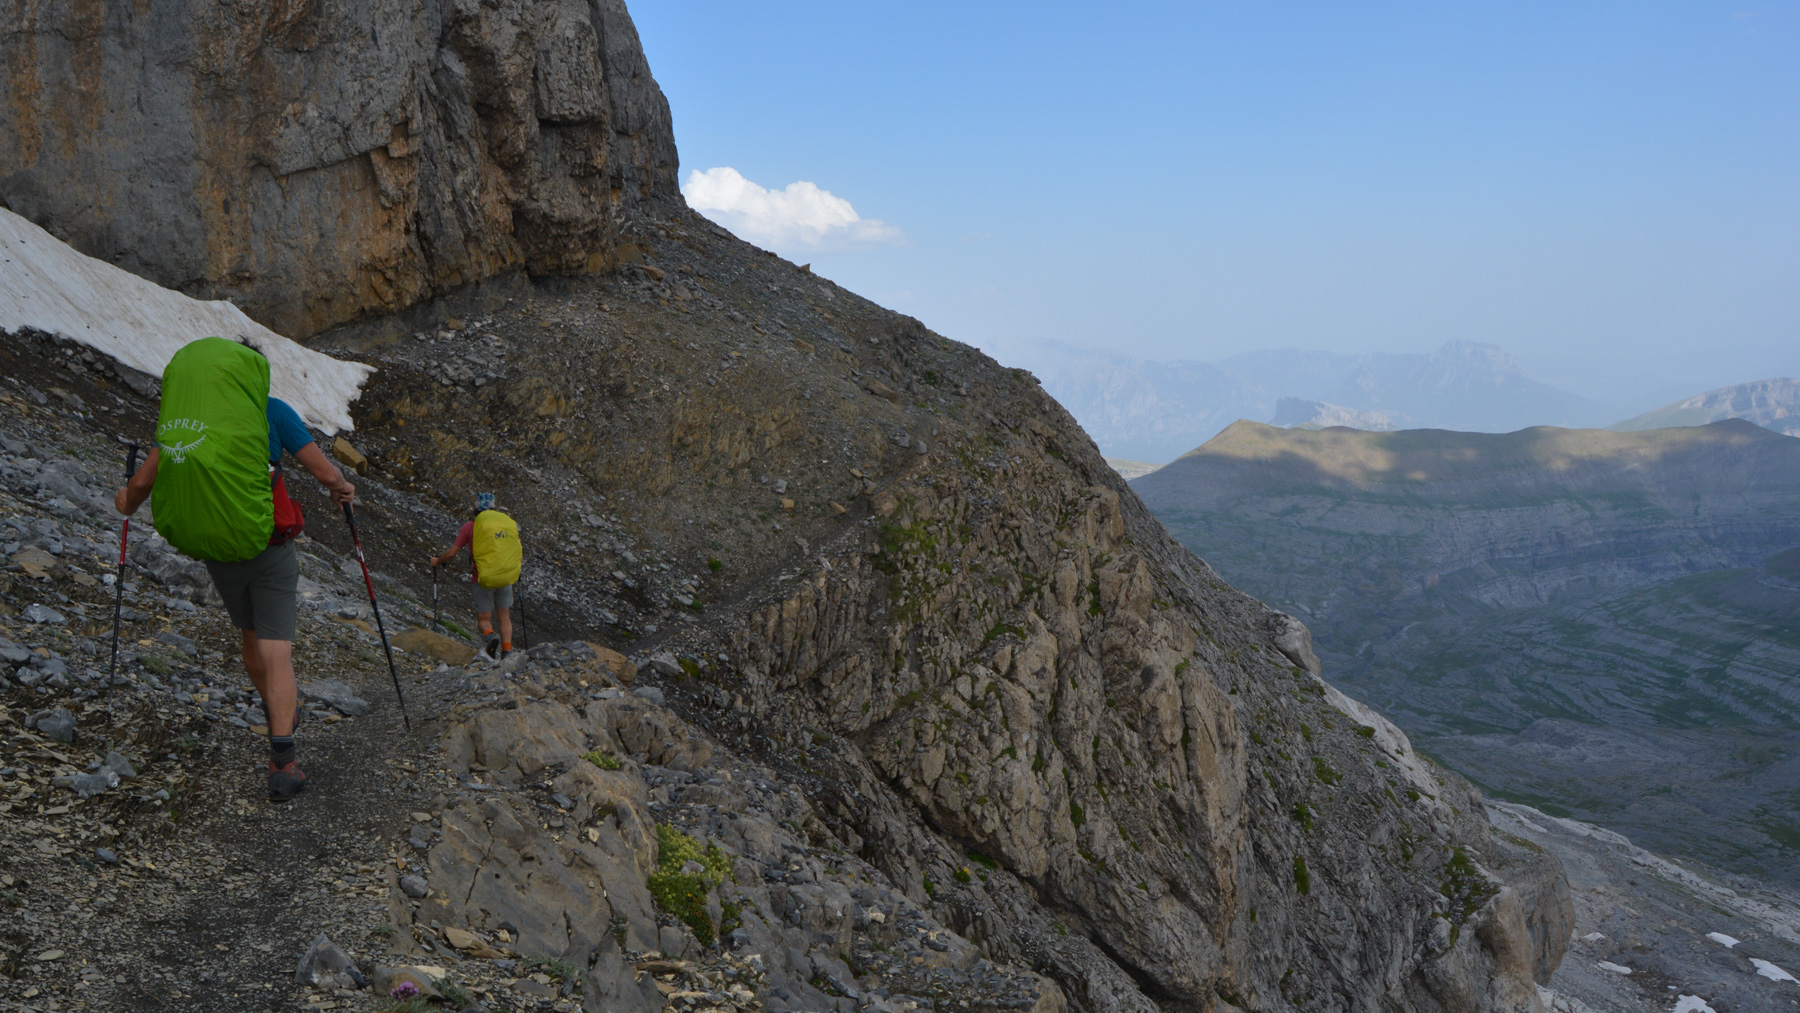 Monte Perdido et Faja de las Flores, Jour 1, Ordesa, Aragon, Espagne 33